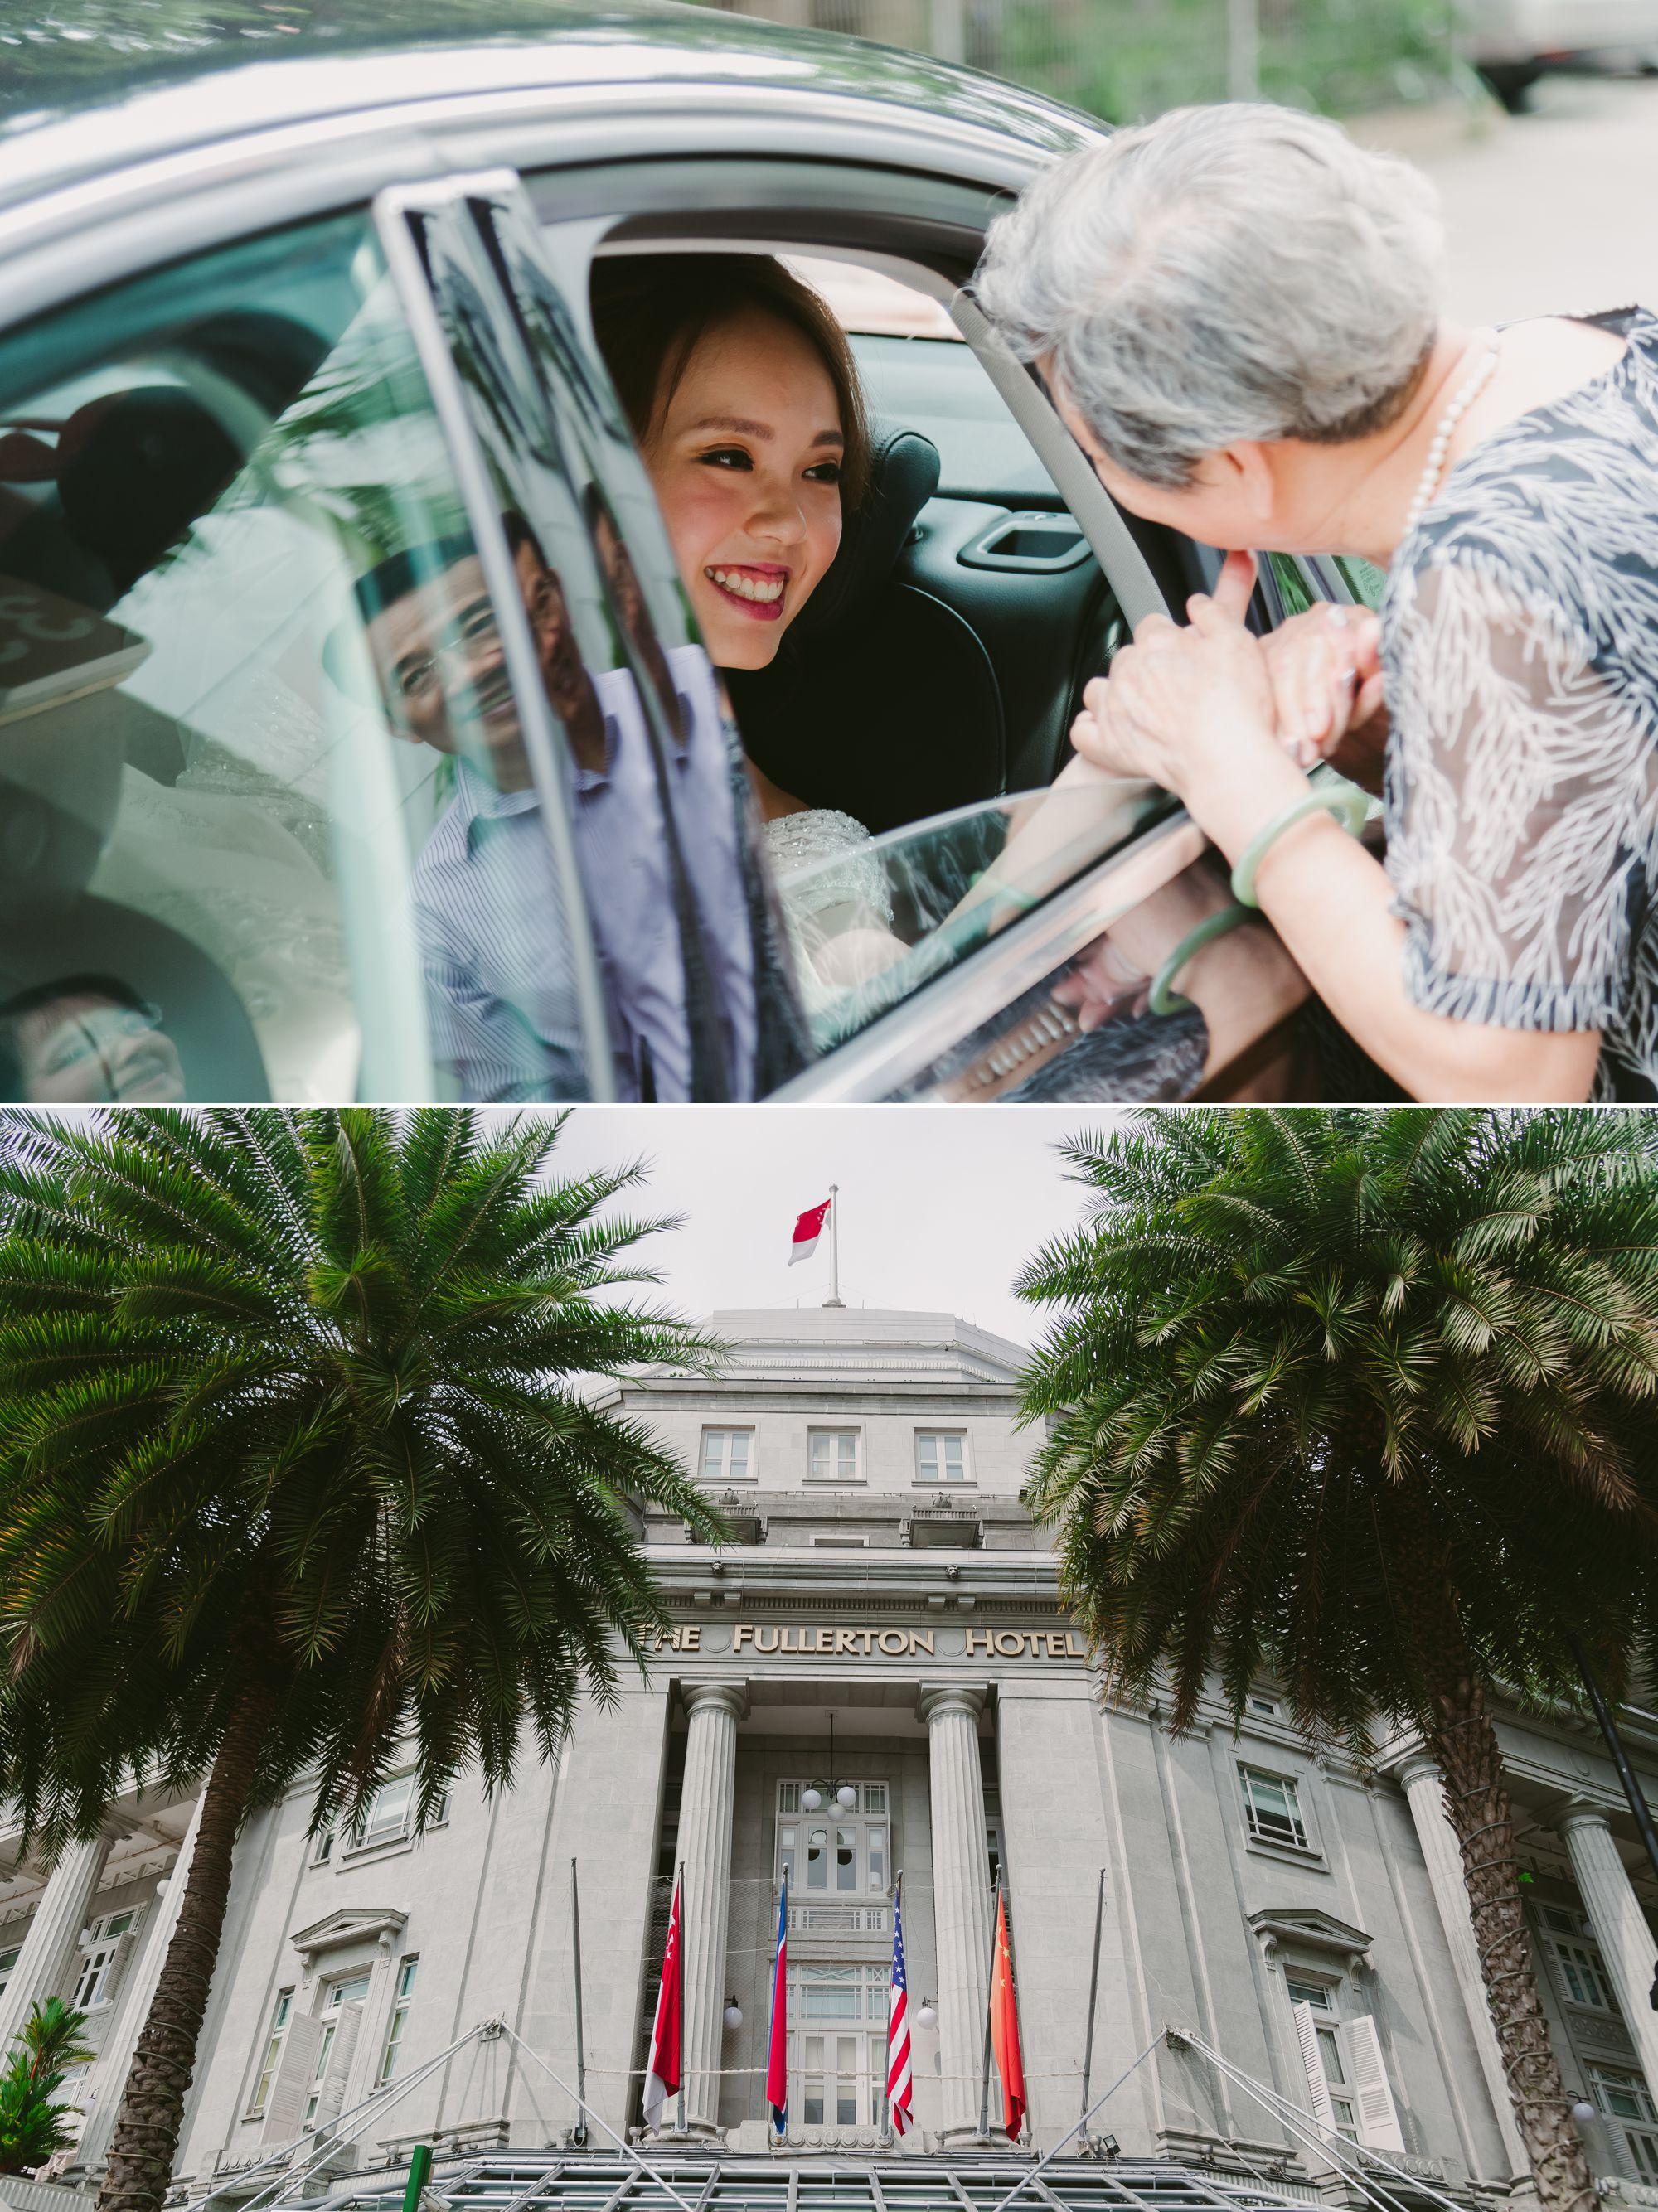 fullerton_singapore_photography_ 13.jpg